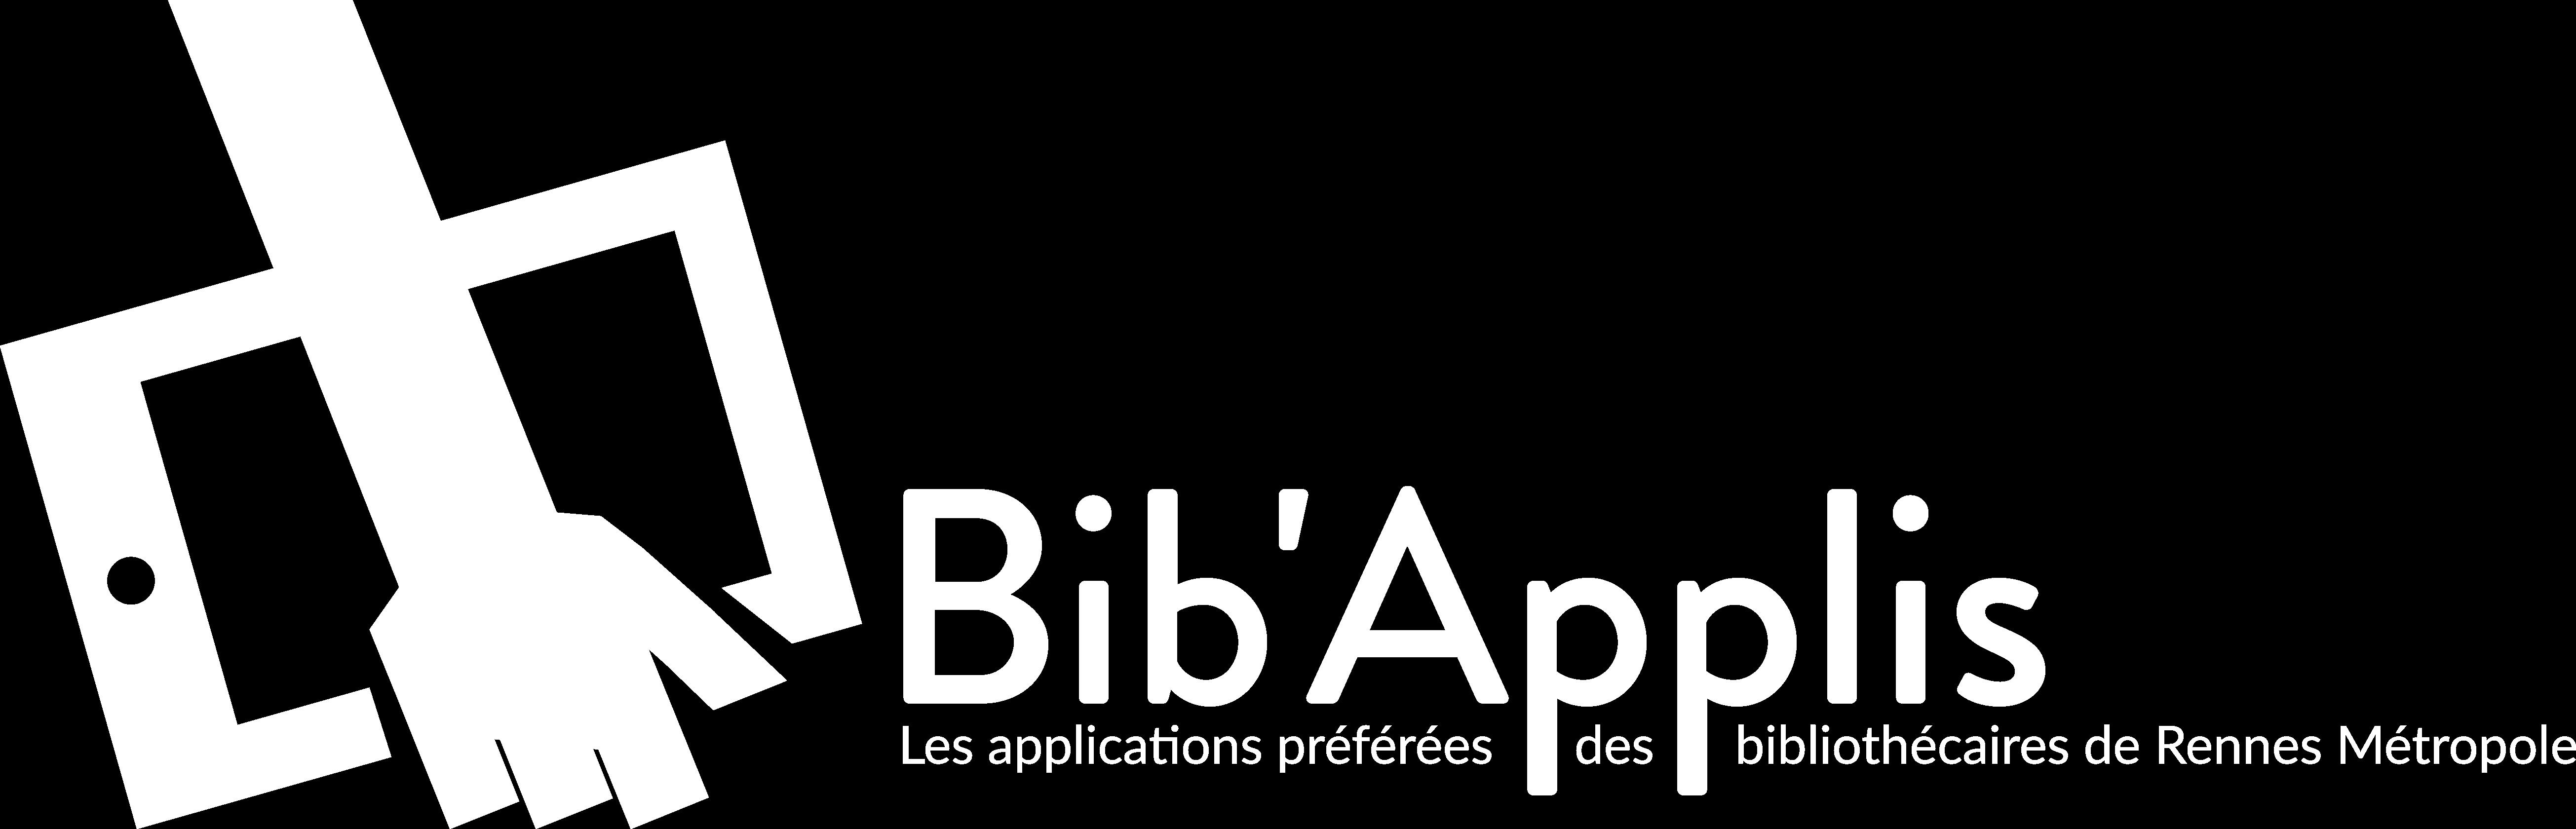 Bib'Applis